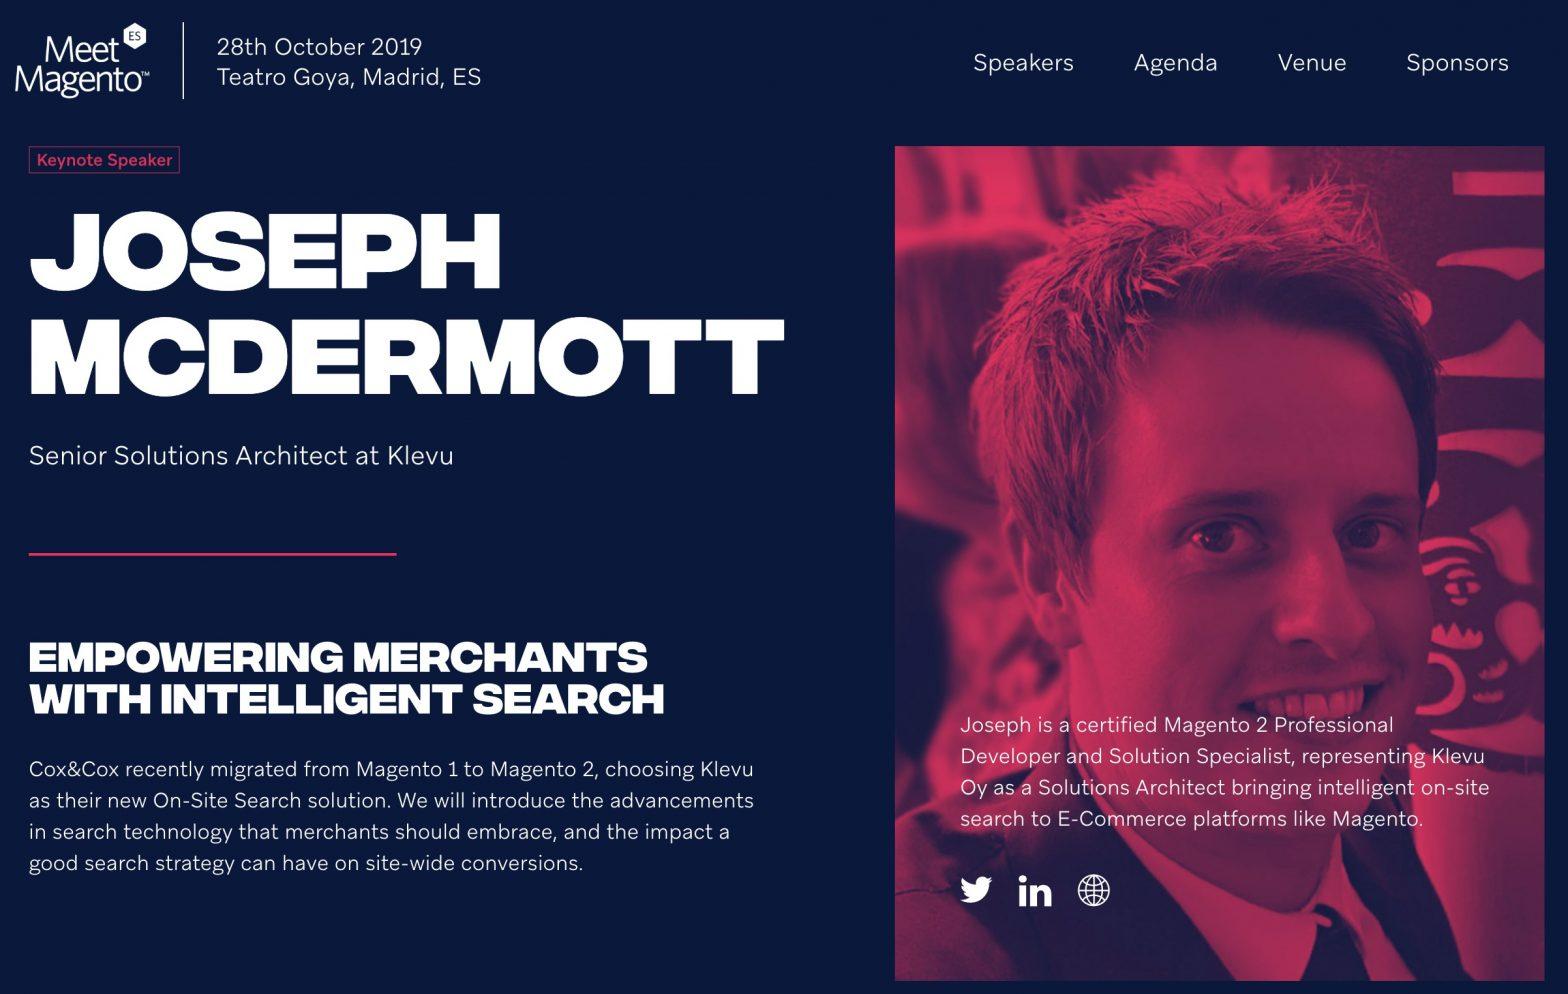 Keynote Meet Magento Spain